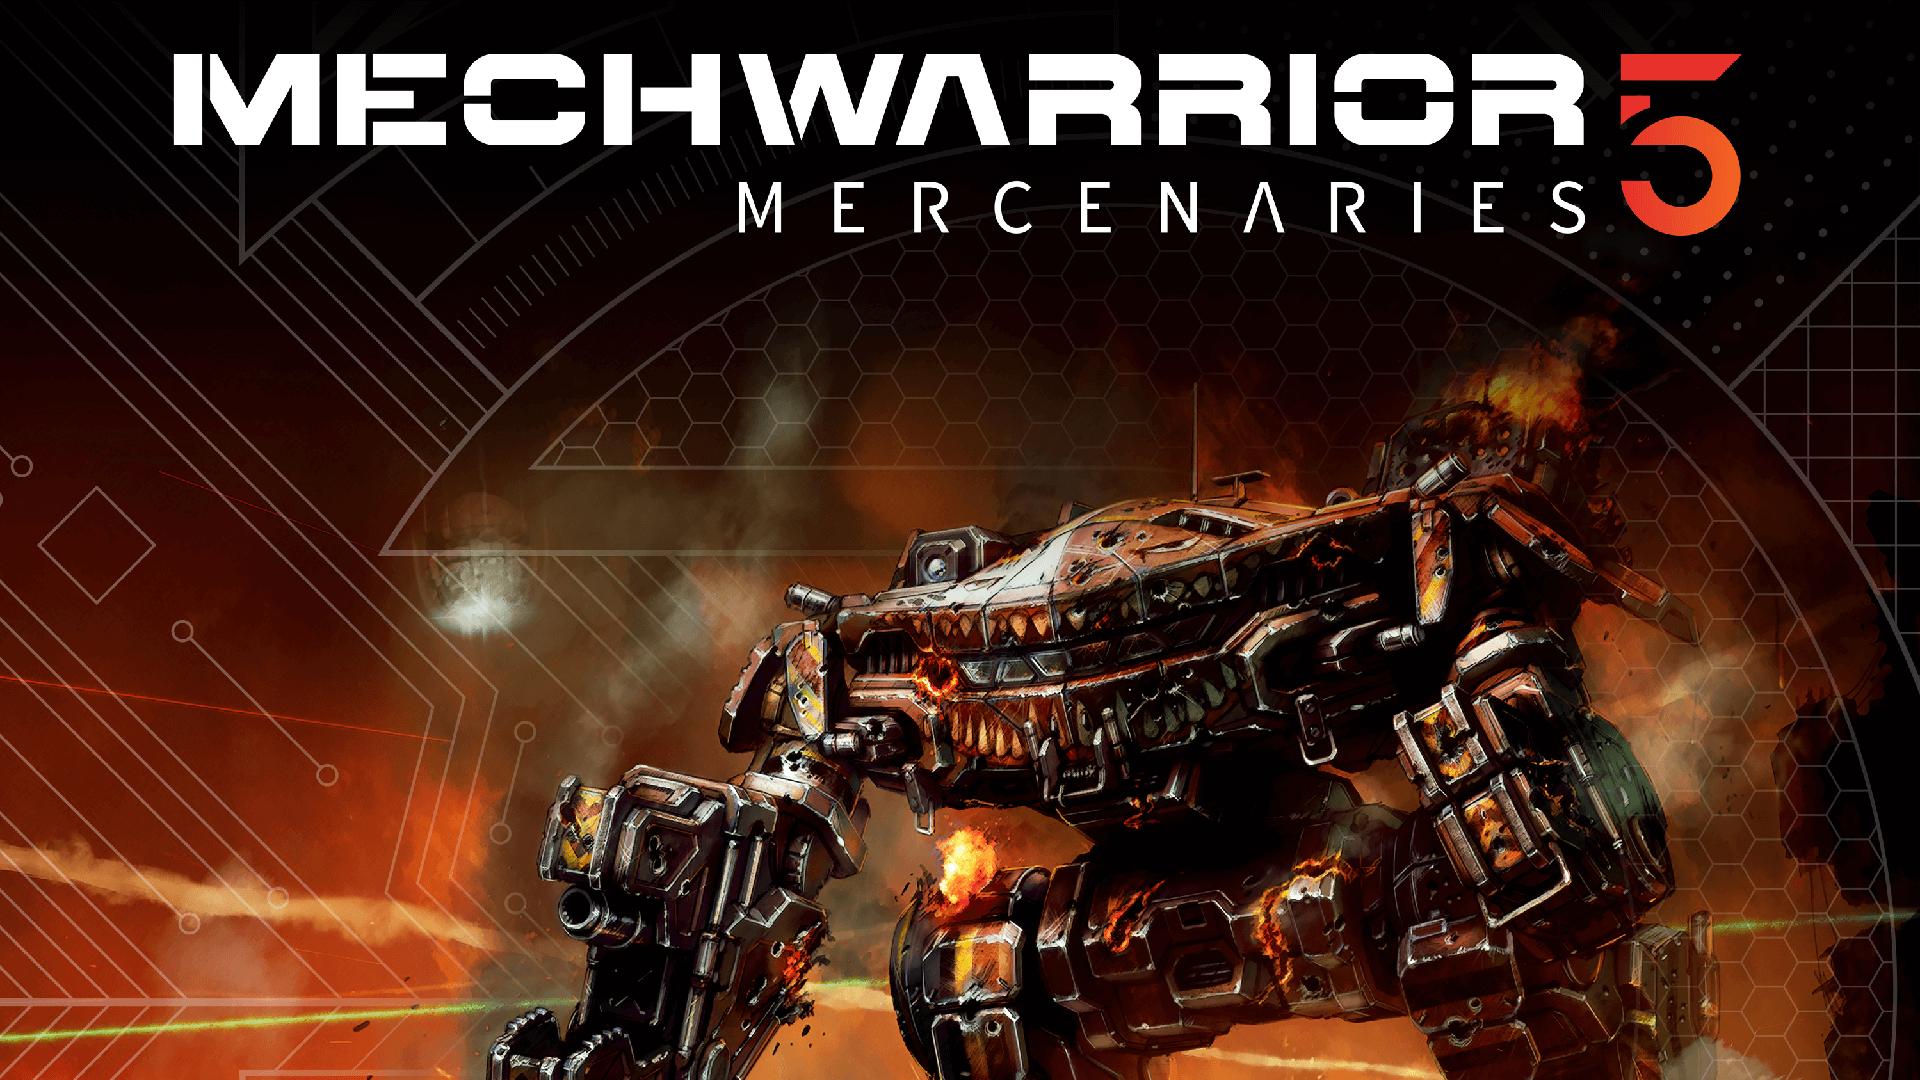 MechWarrior 5: Mercenaries Review: Into the Breach We Go